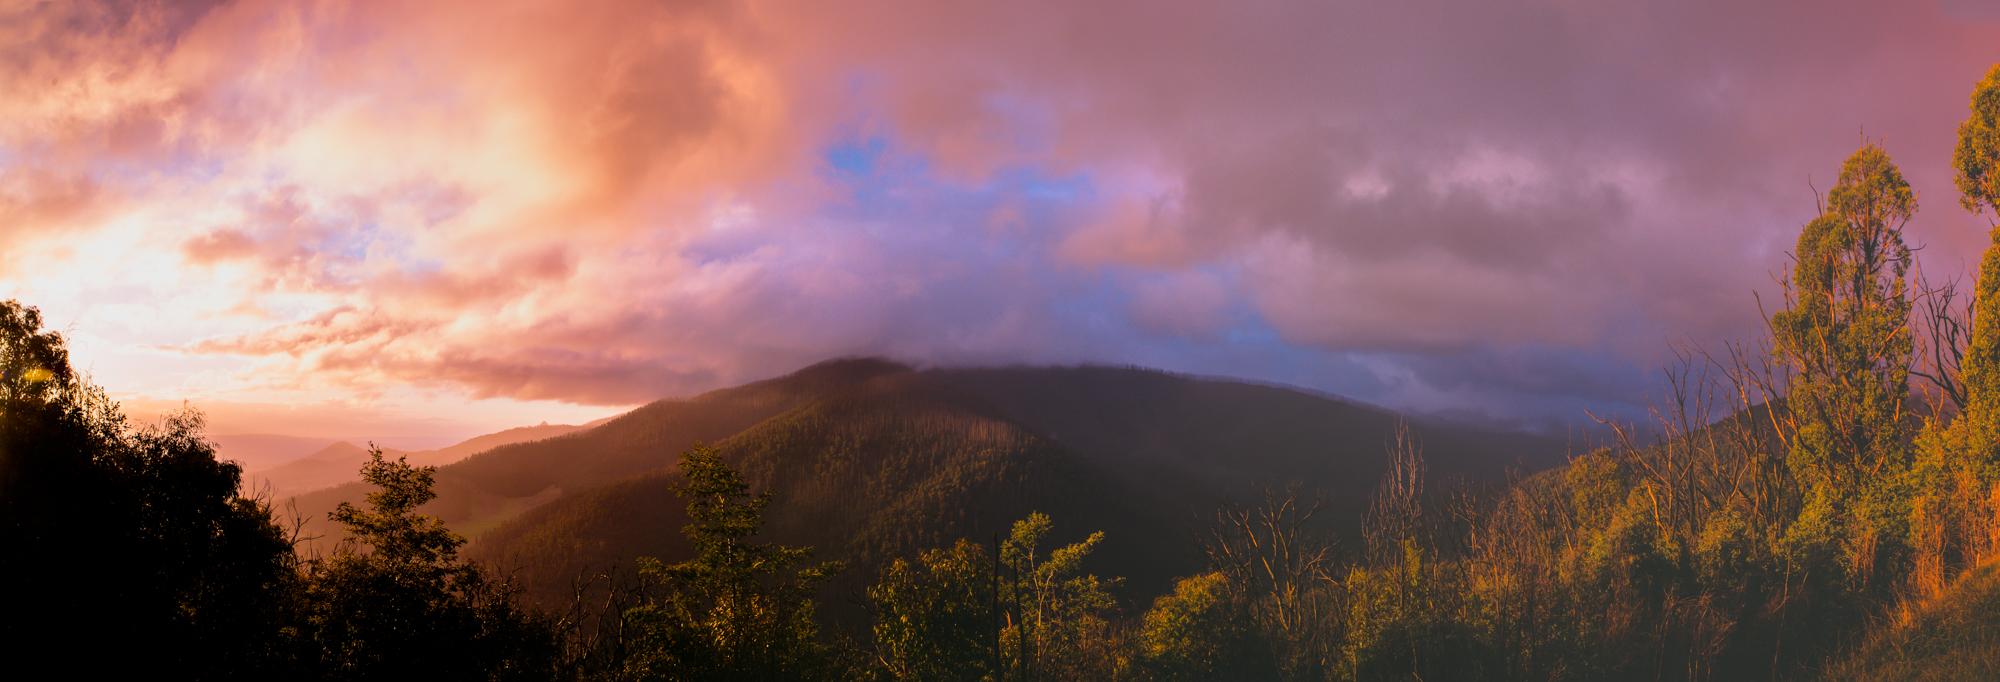 Martin_Reddy_lake_Mountain.jpg